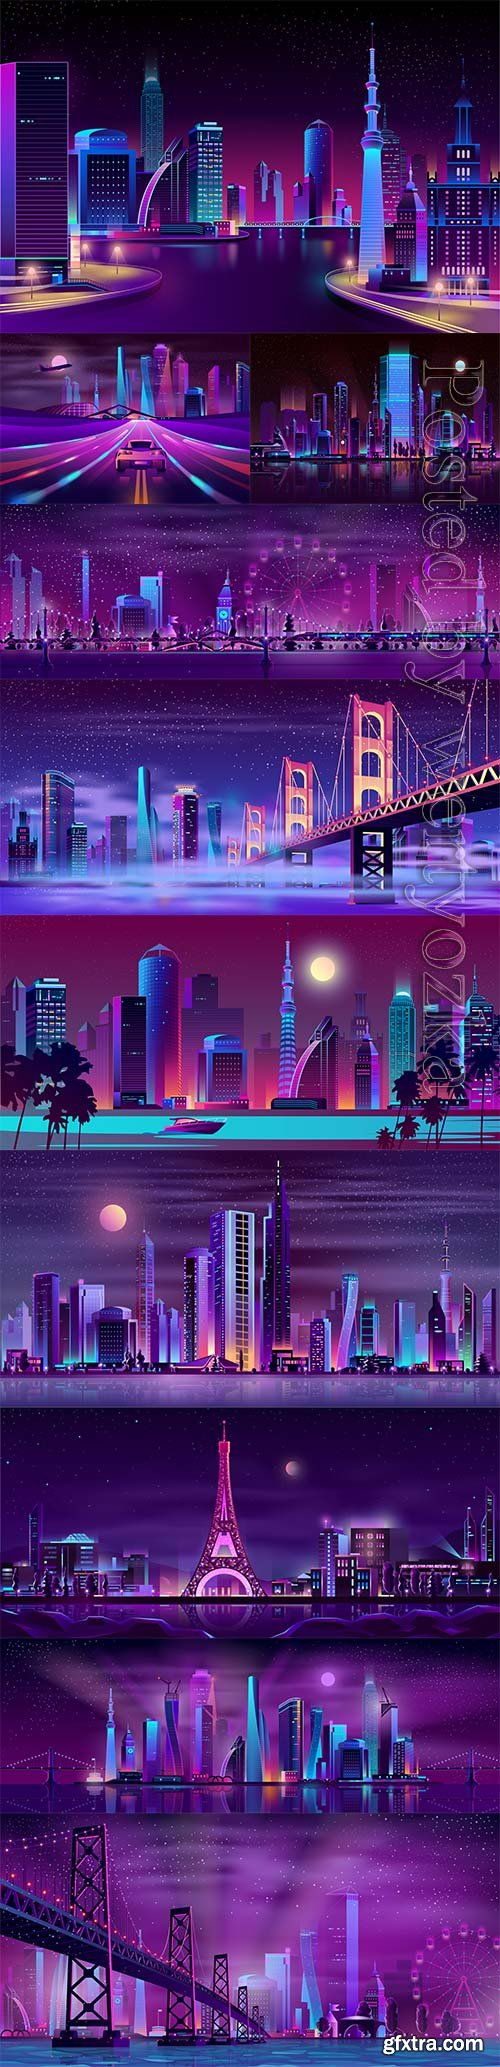 Night streets cartoon vector background